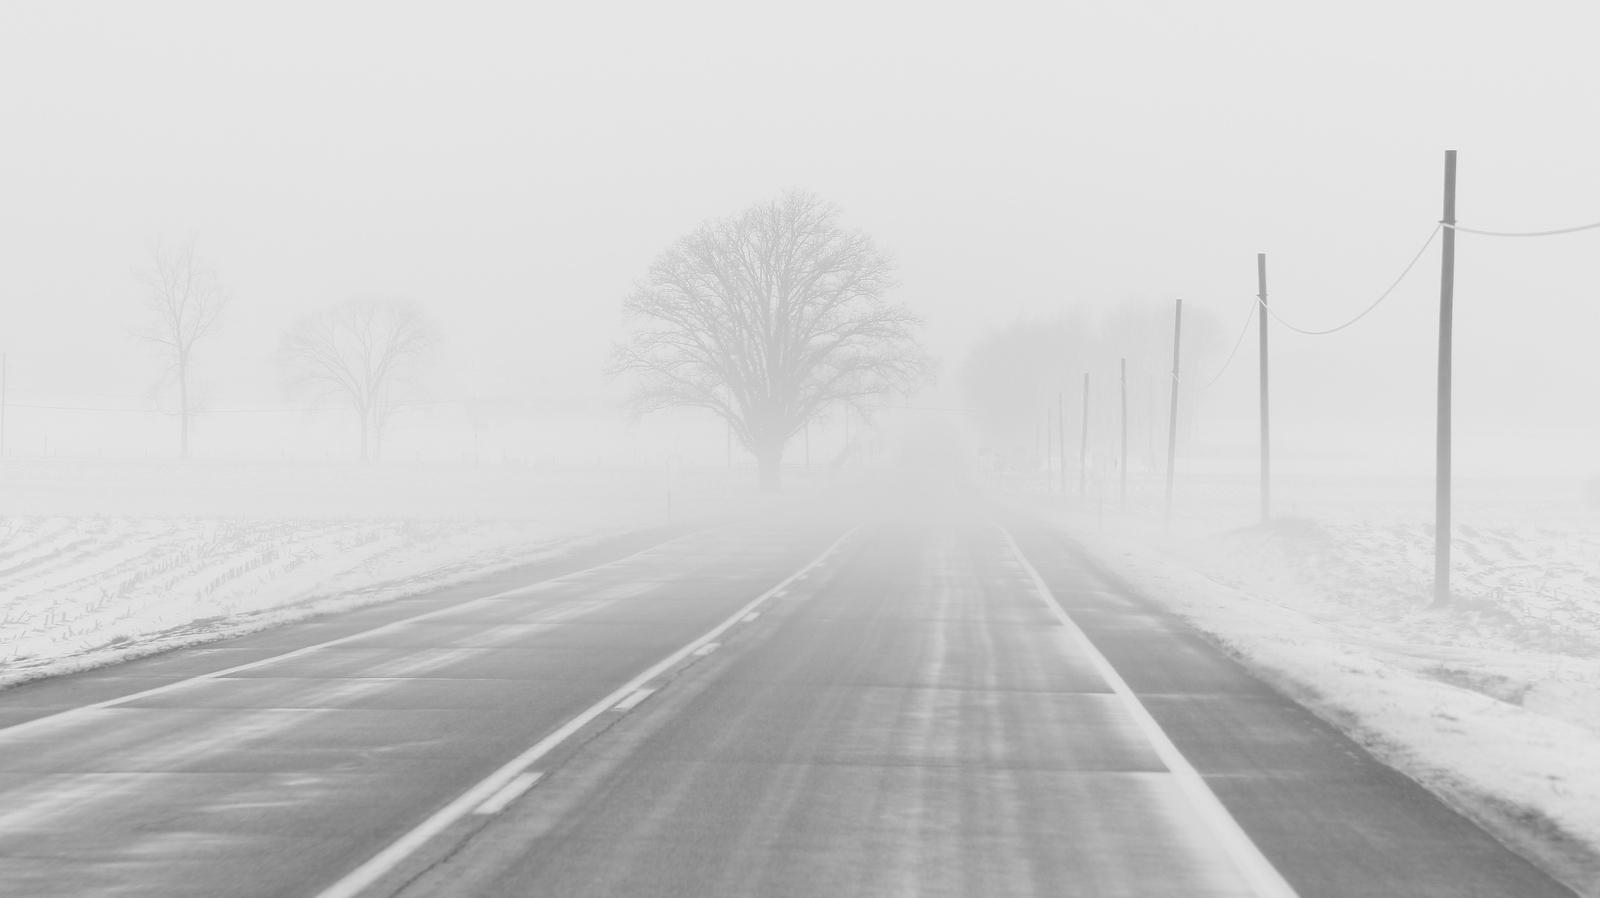 Брянских водителей предупредили о тумане и гололеде 28 января